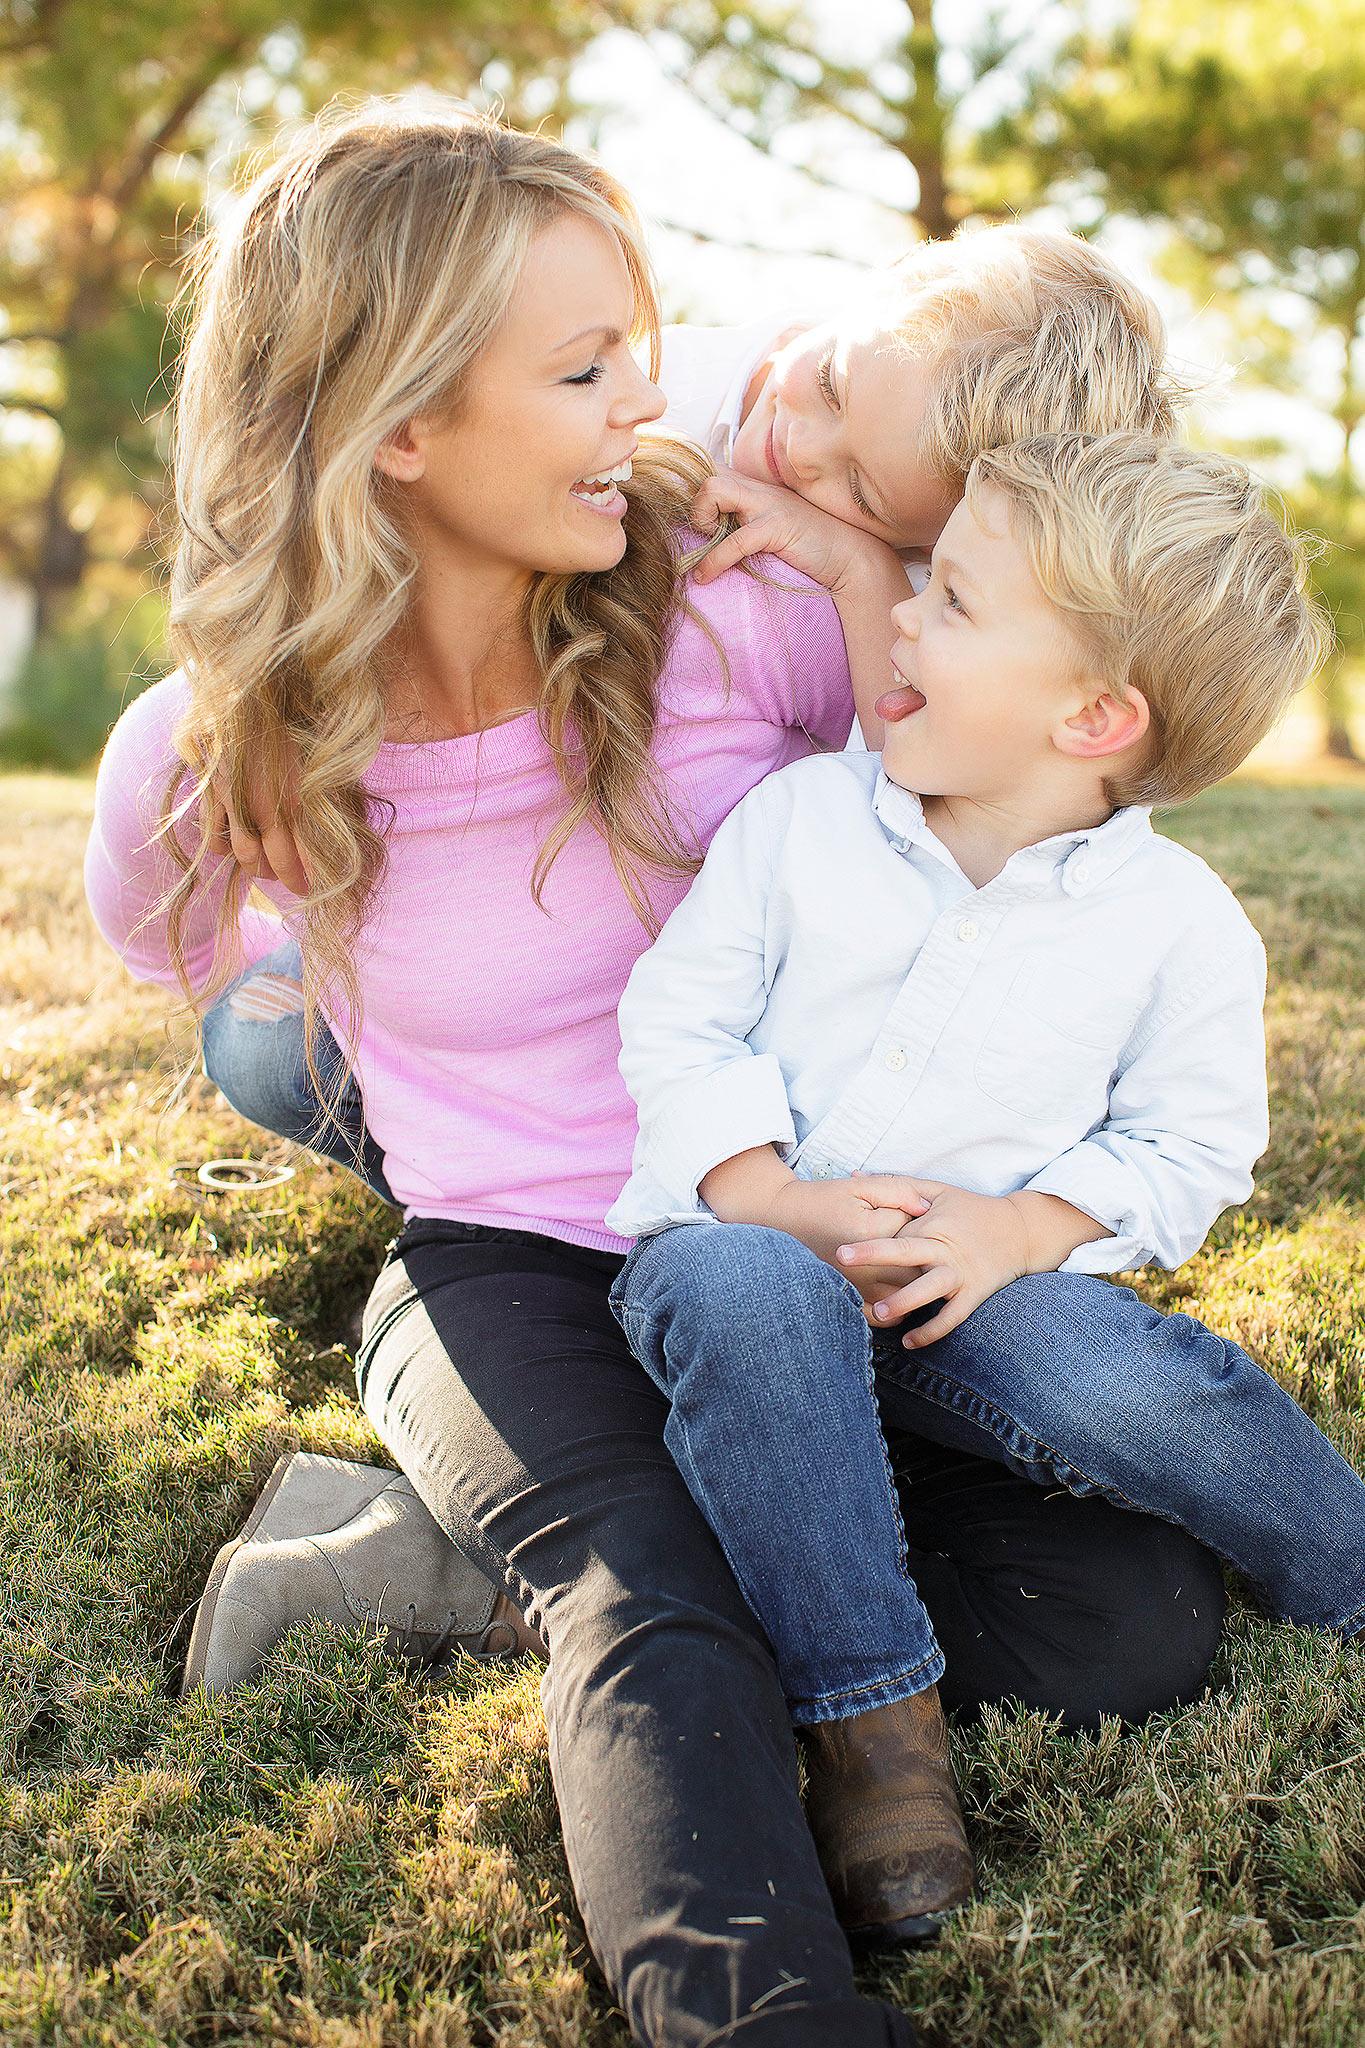 PhotoLove_FamilyHeros02w.jpg